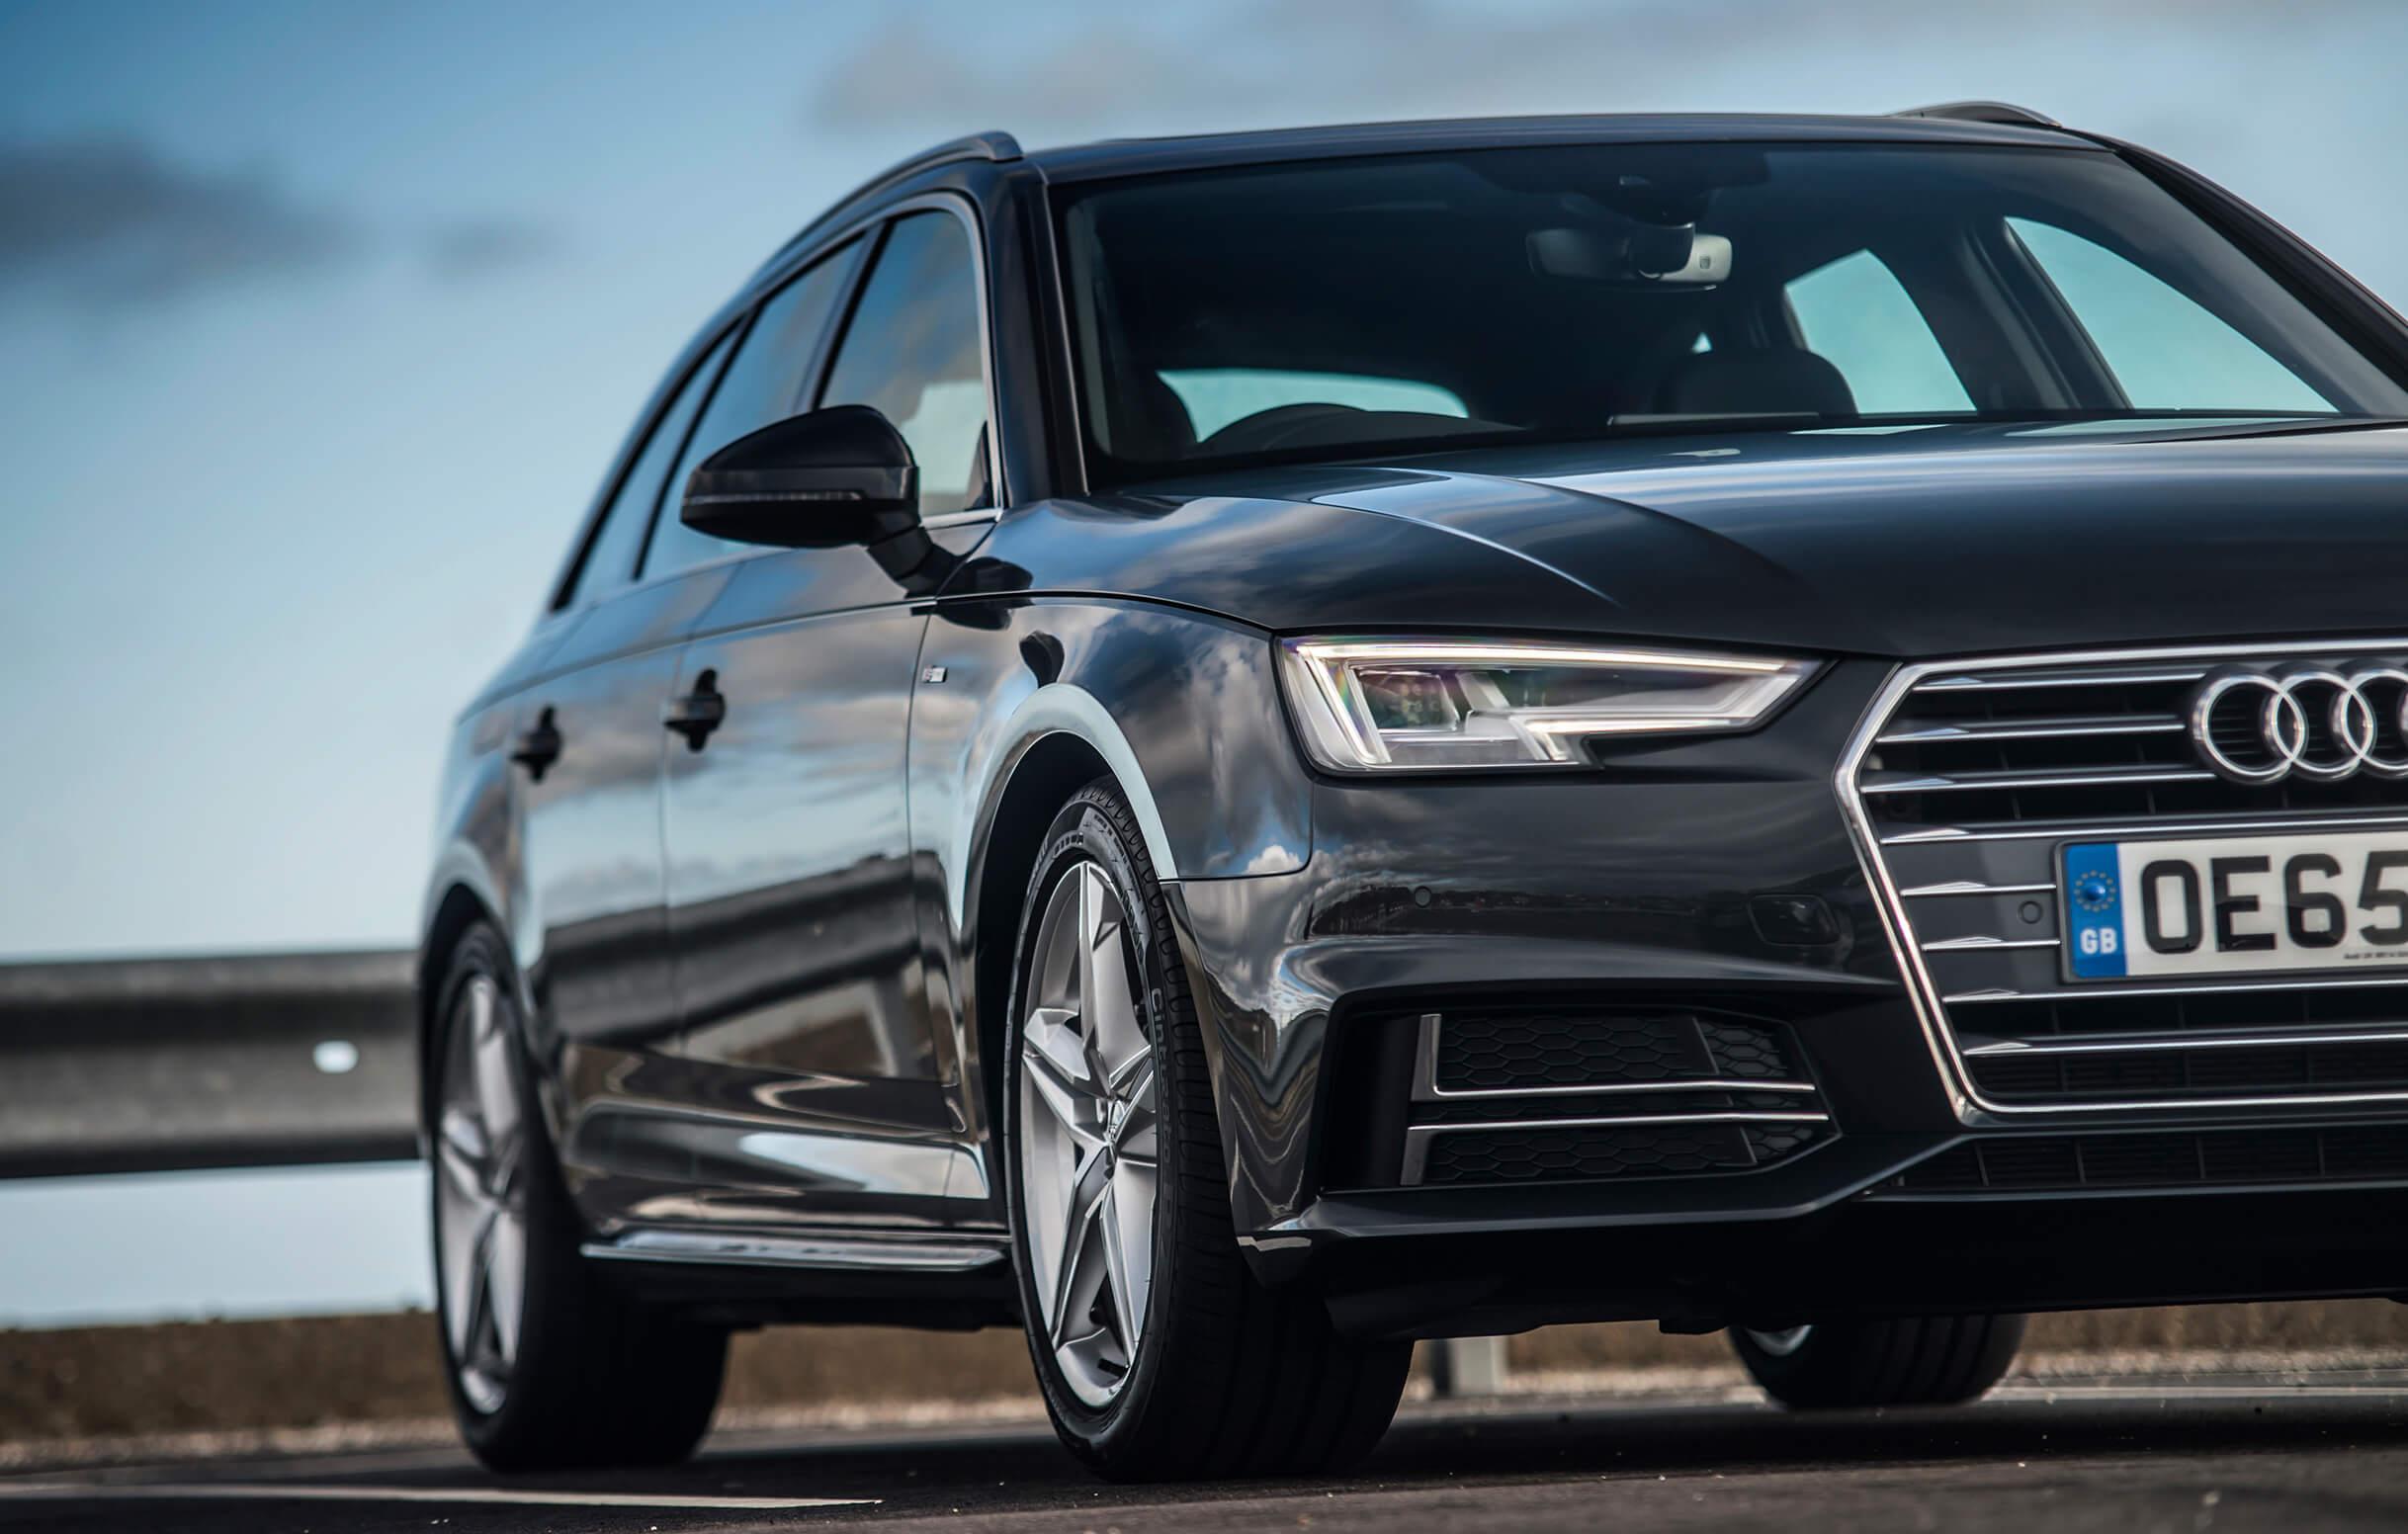 Audi A4 allroad V (B9) 2016 - now Station wagon 5 door #3